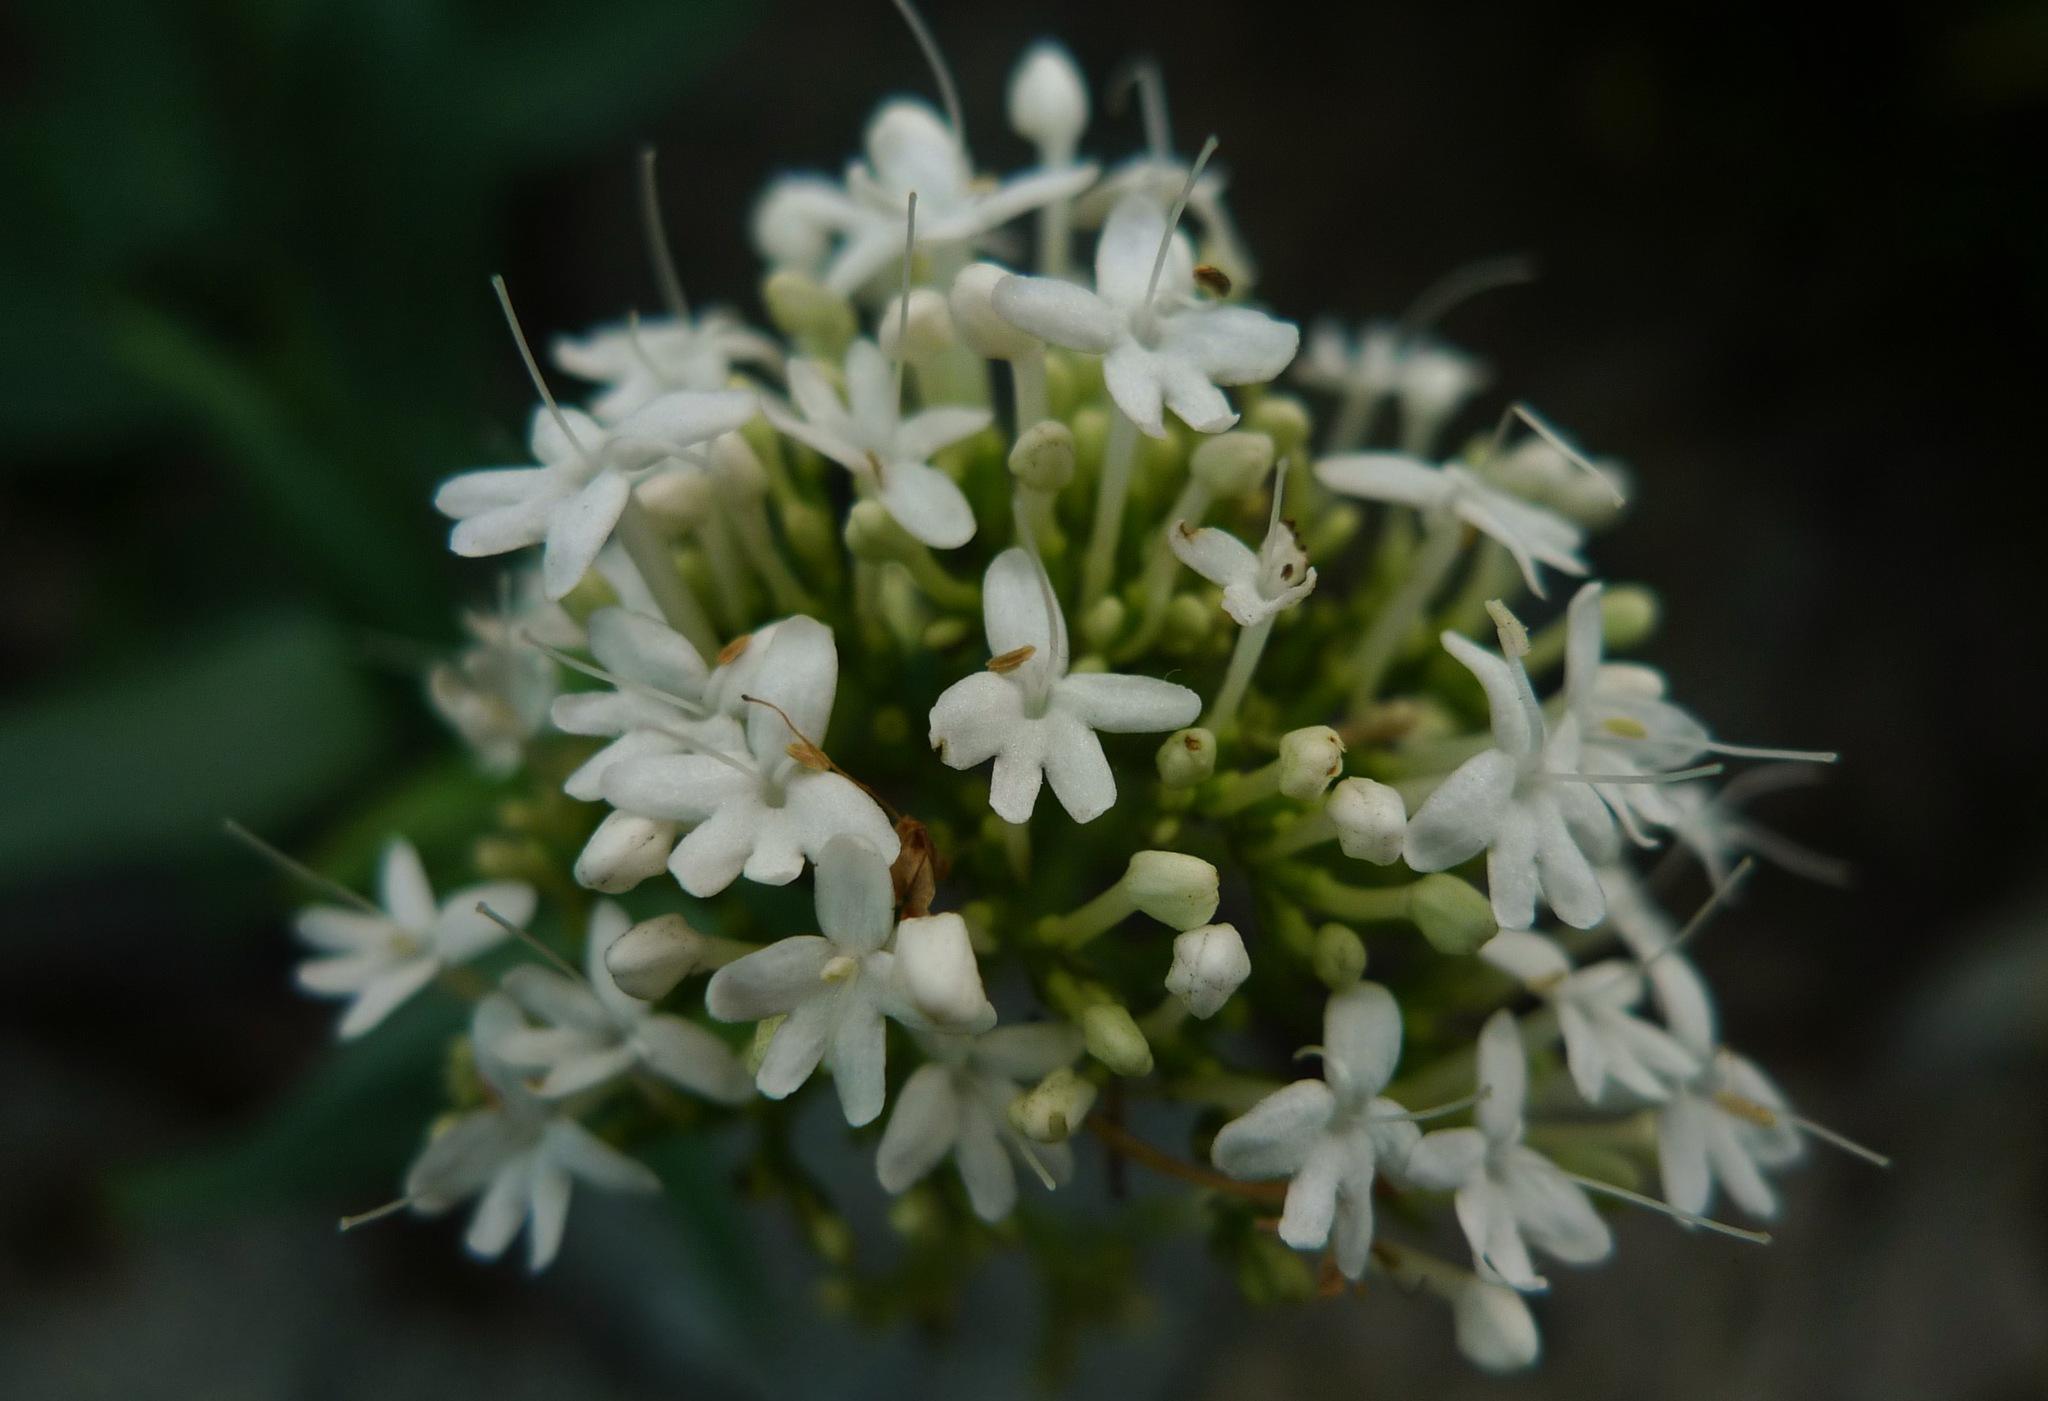 flower 26 by solenoid